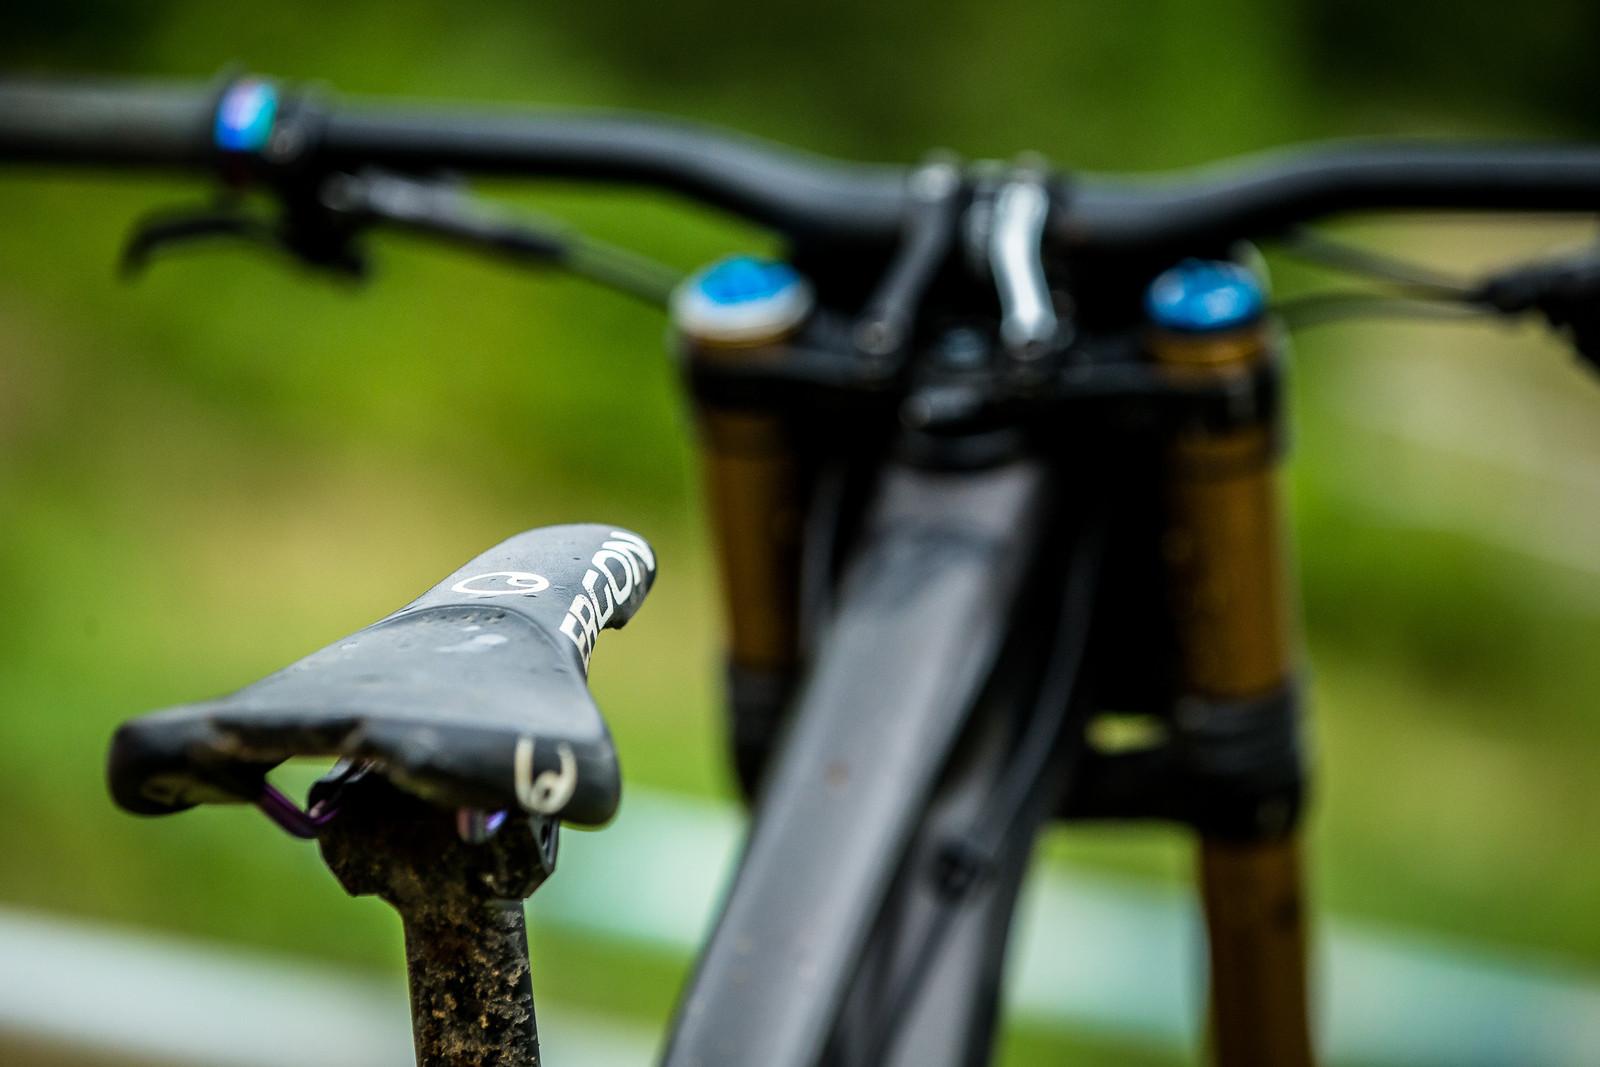 Ergon SMD2 MTB Gravity Saddle - WINNING BIKE: Tahnee Seagrave's Transition TR11 - Mountain Biking Pictures - Vital MTB